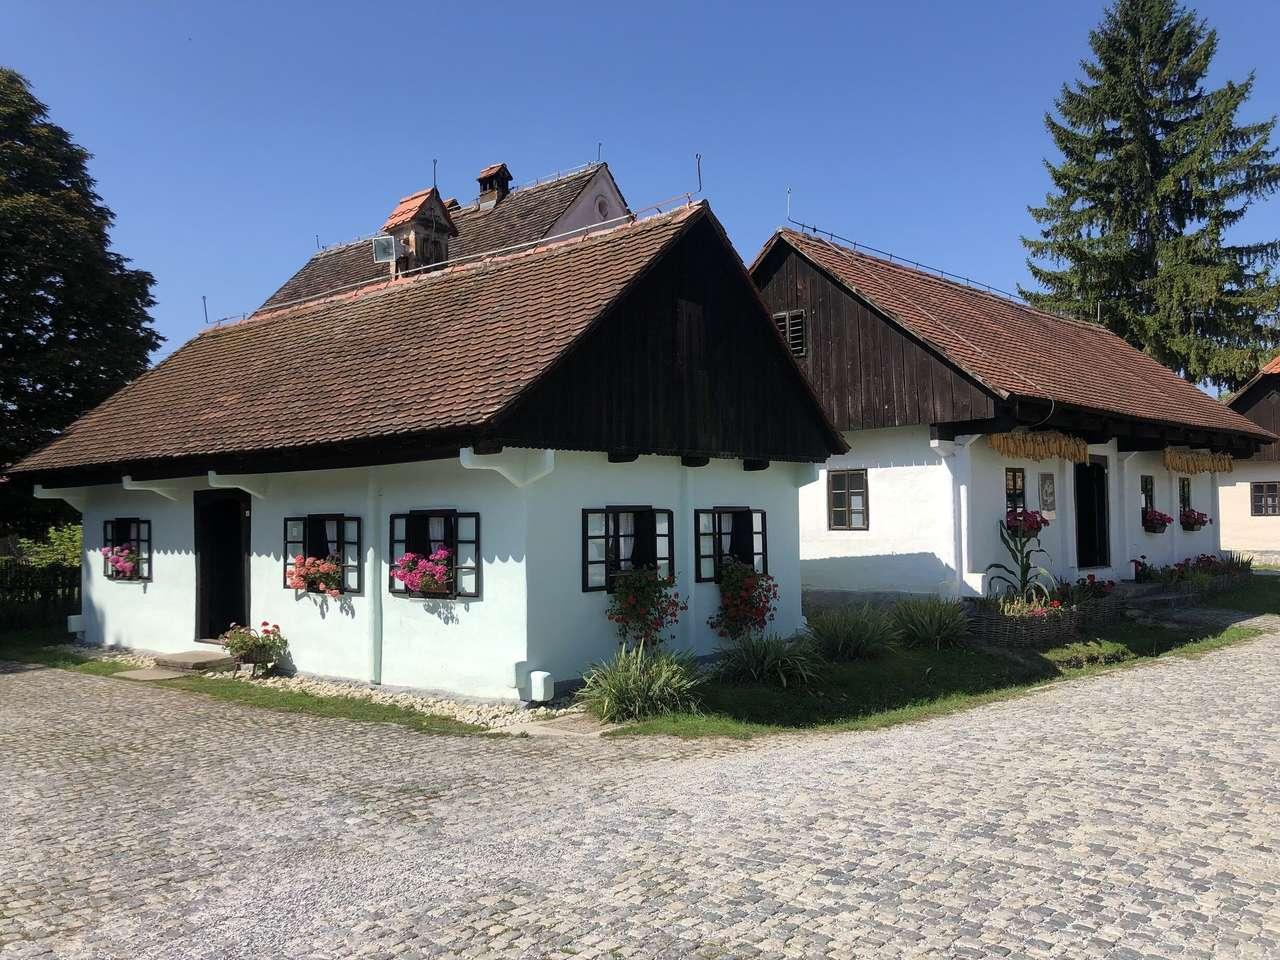 Medimurje Красиви къщи Хърватия (14×11)